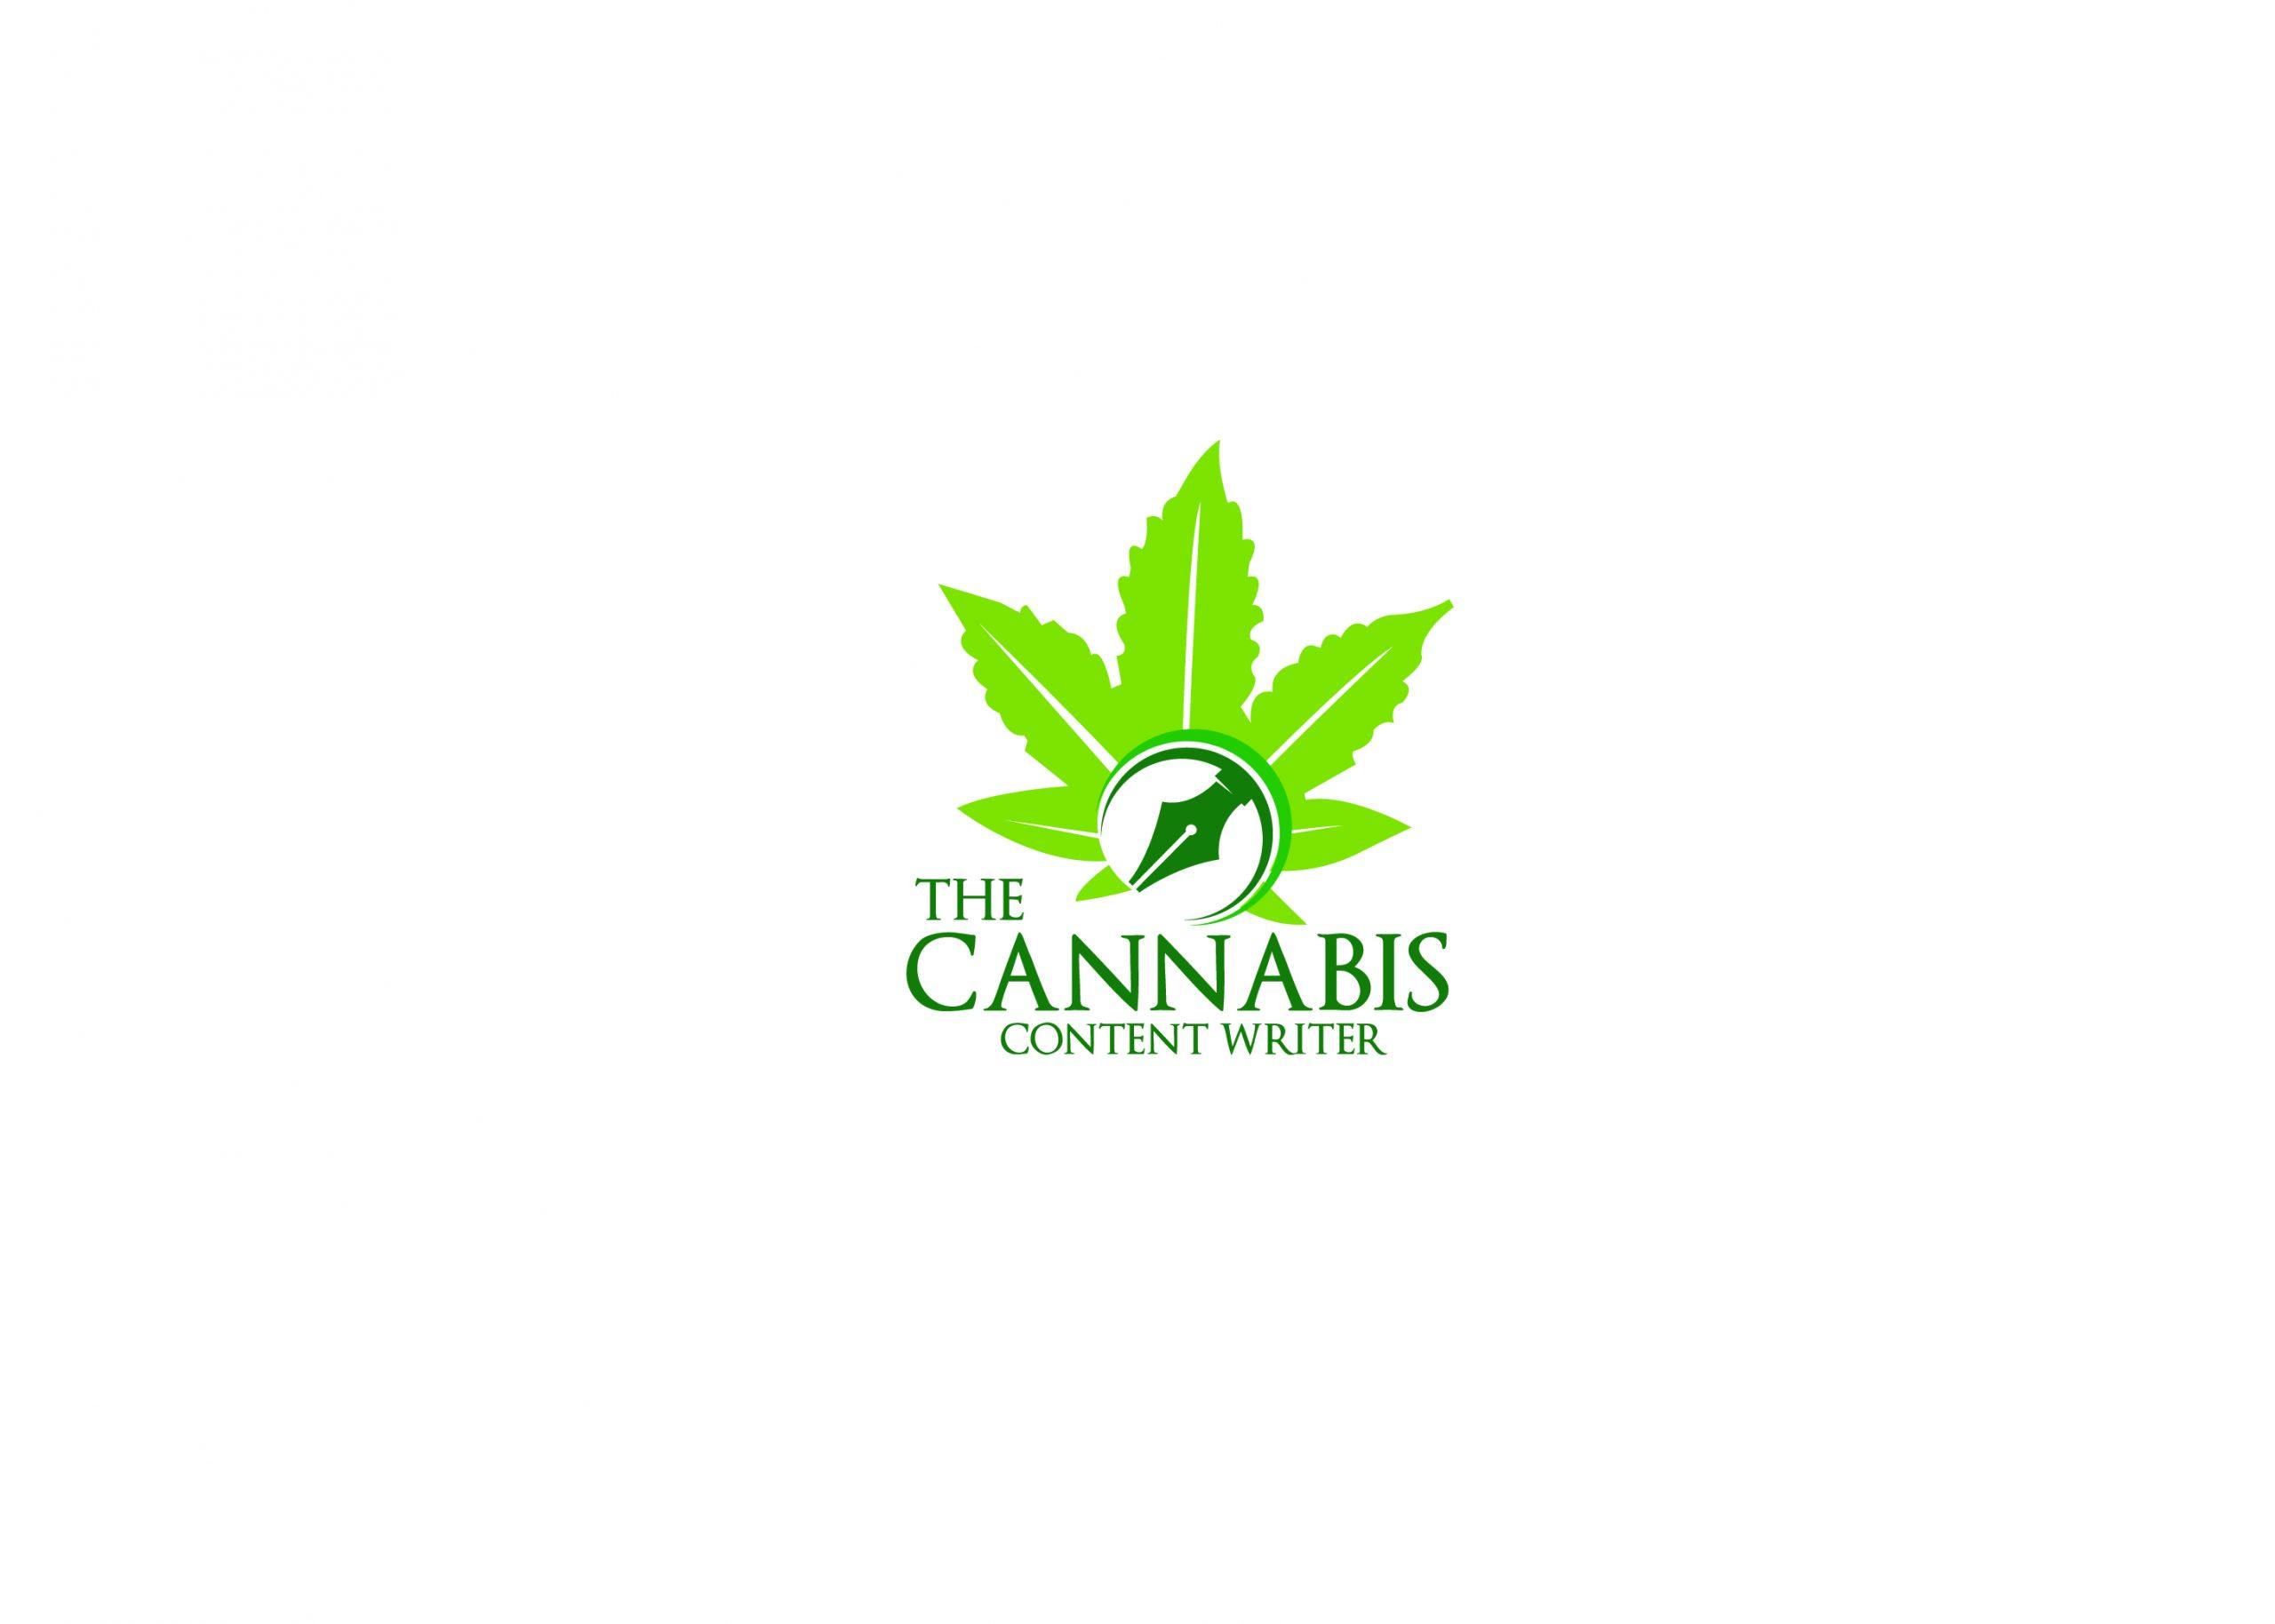 thecannabiscontentwriter.com